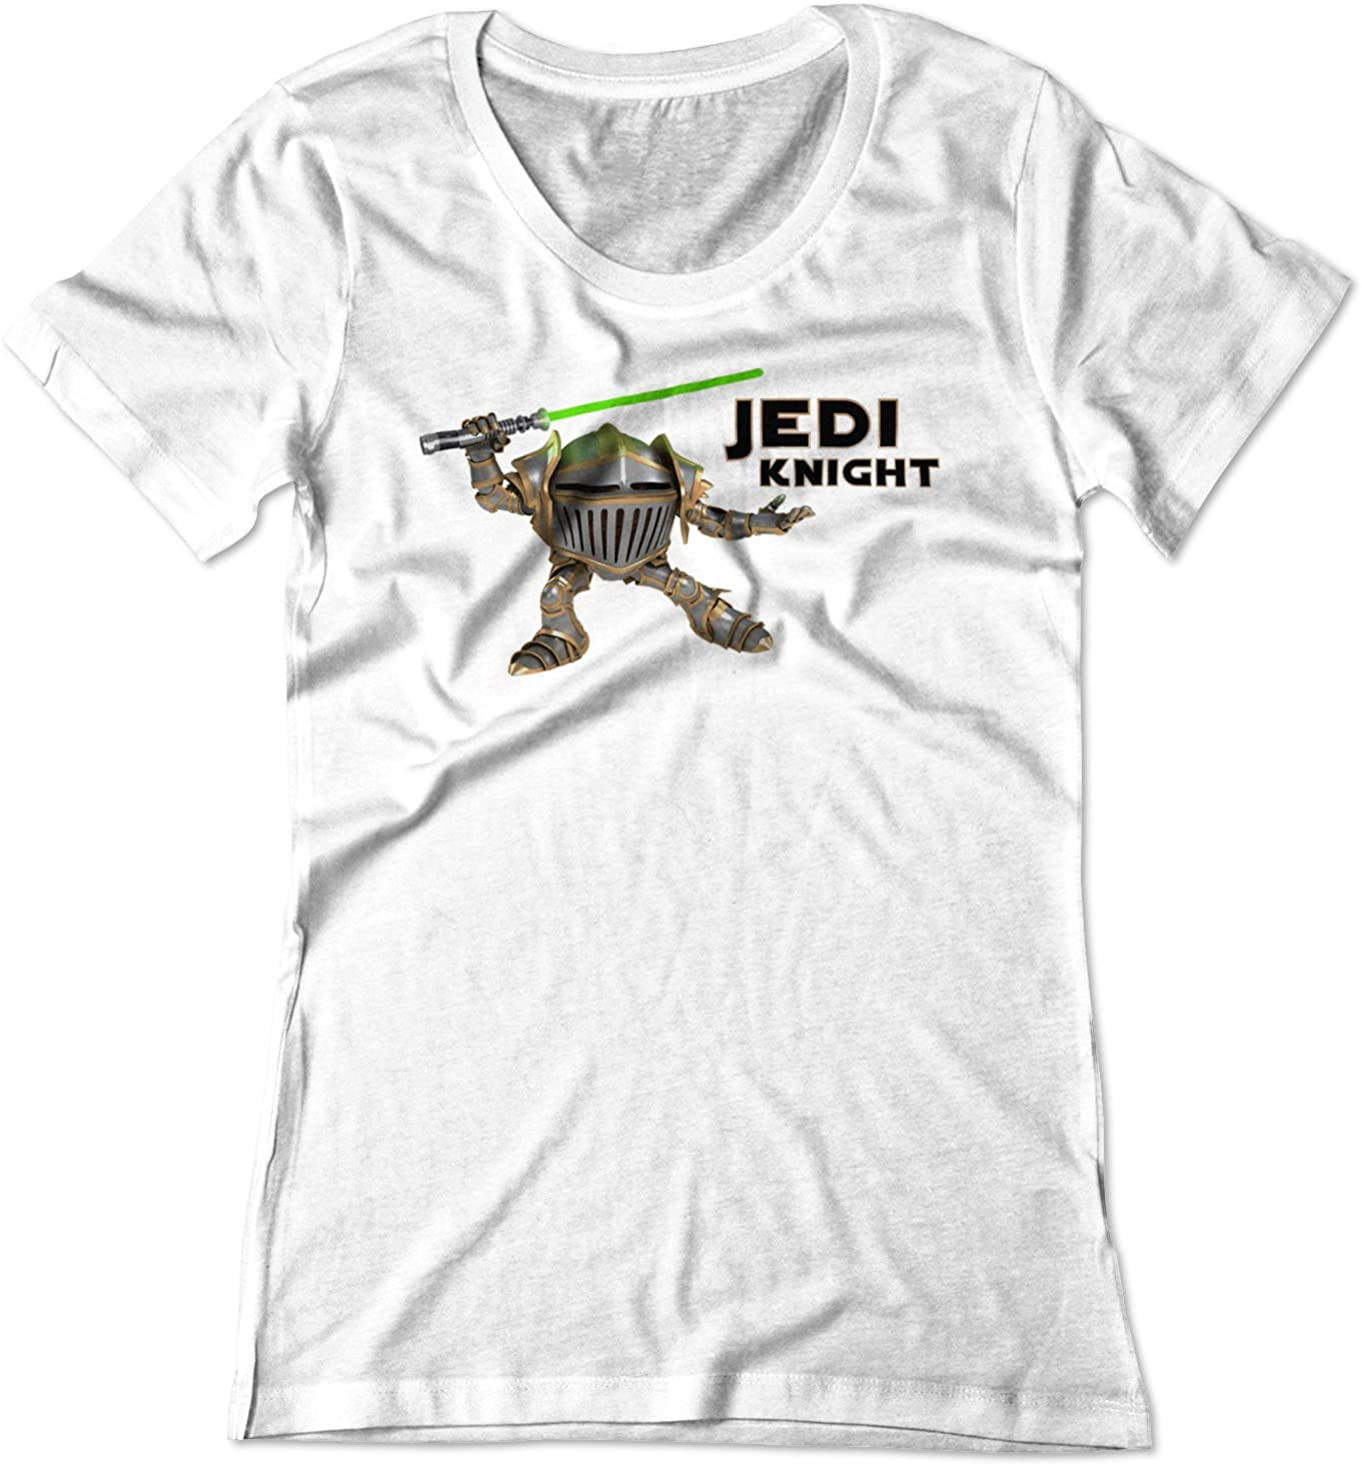 Jedi Knight Star Wars Armor Skywalker Shirt